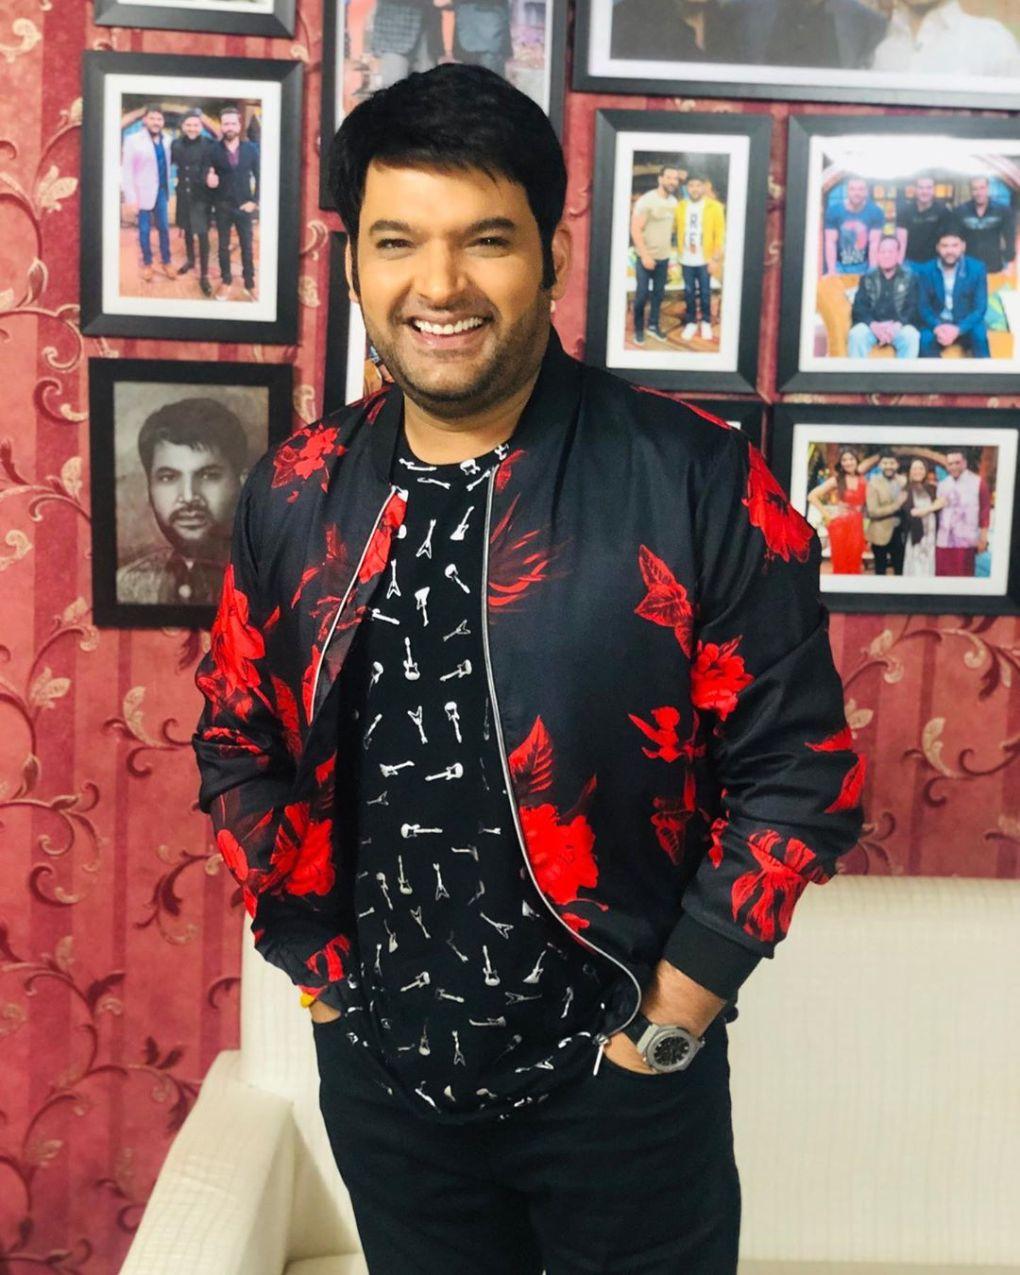 Comedian Kapil Sharma Age, Height, Biography 2020 Wiki, Net Worth, Wife